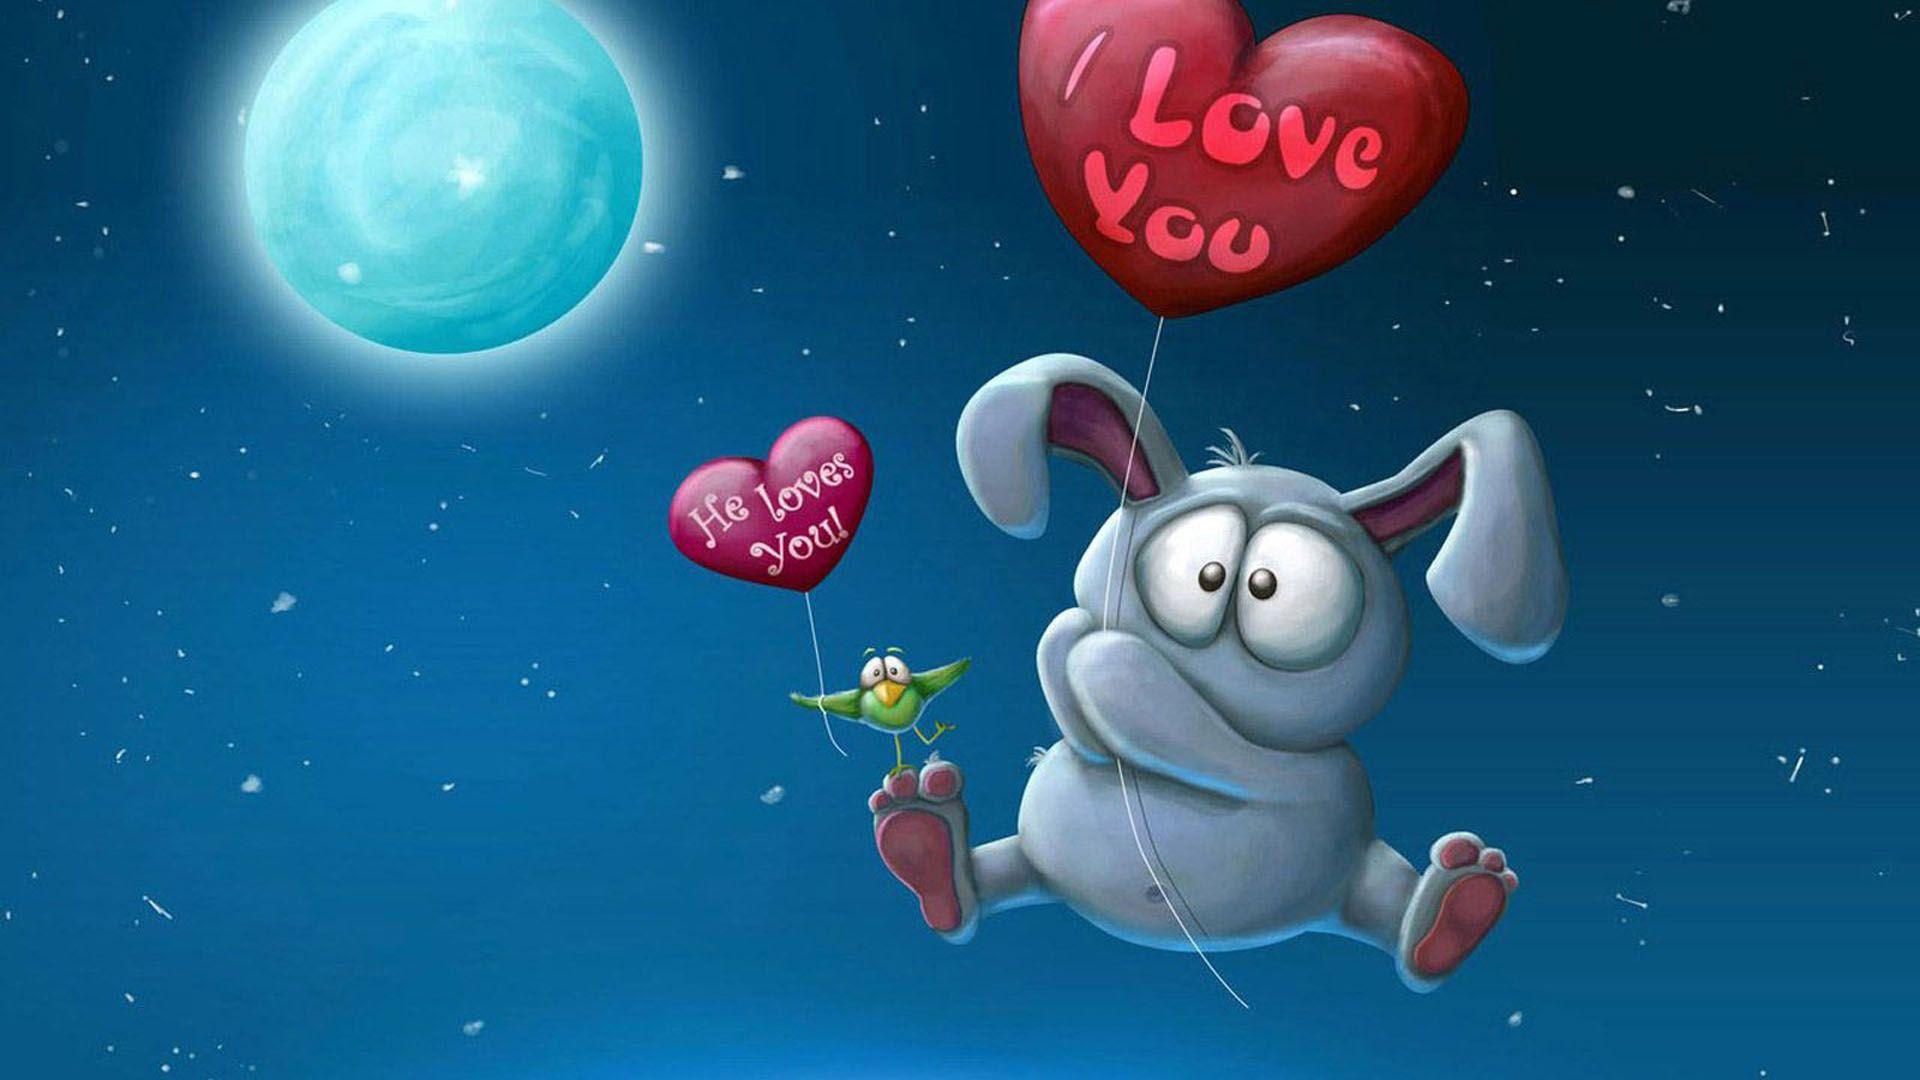 Wonderful Wallpaper I Love You Cartoon - 7a3be09a4f3ed2412d57d987833b8f04  You Should Have_211100   .jpg